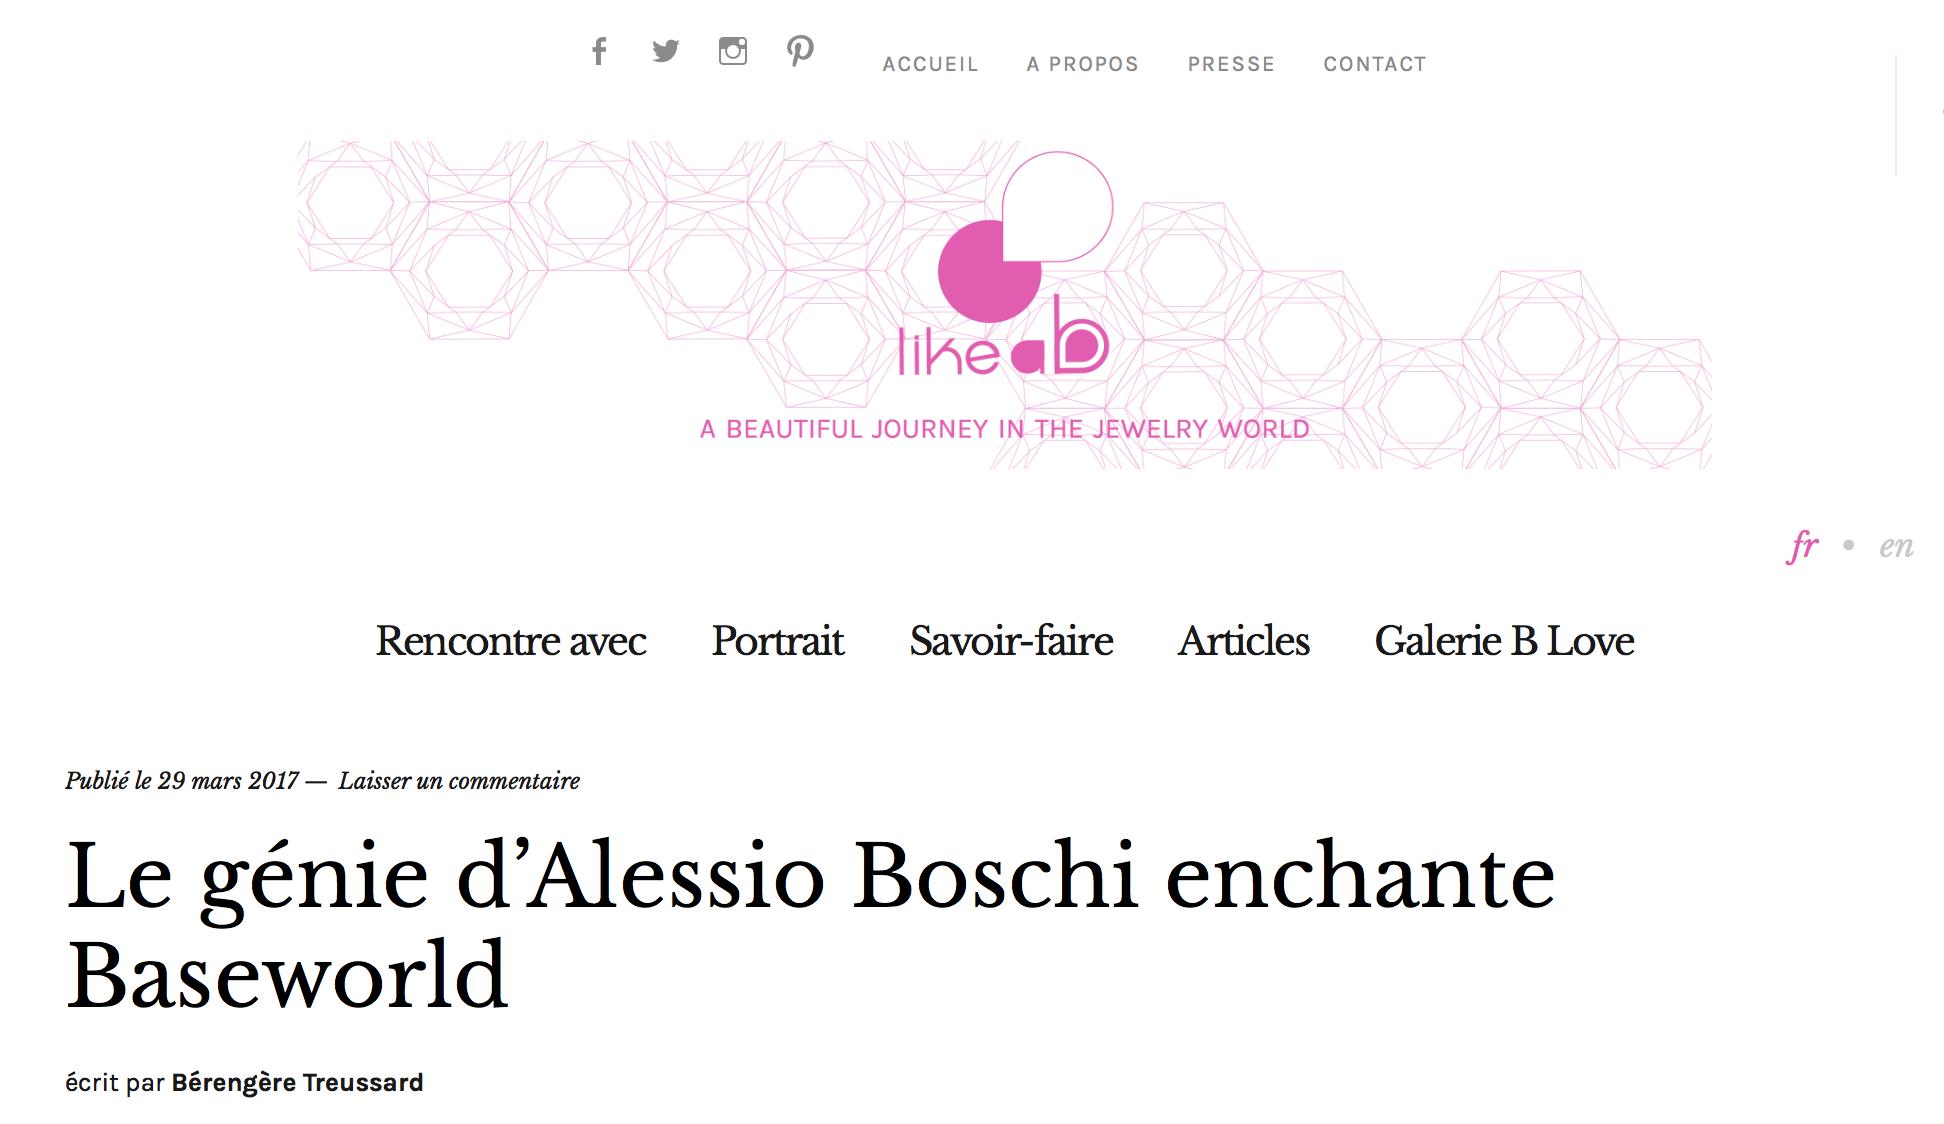 Le génie d'Alessio Boschi enchante Baselworld